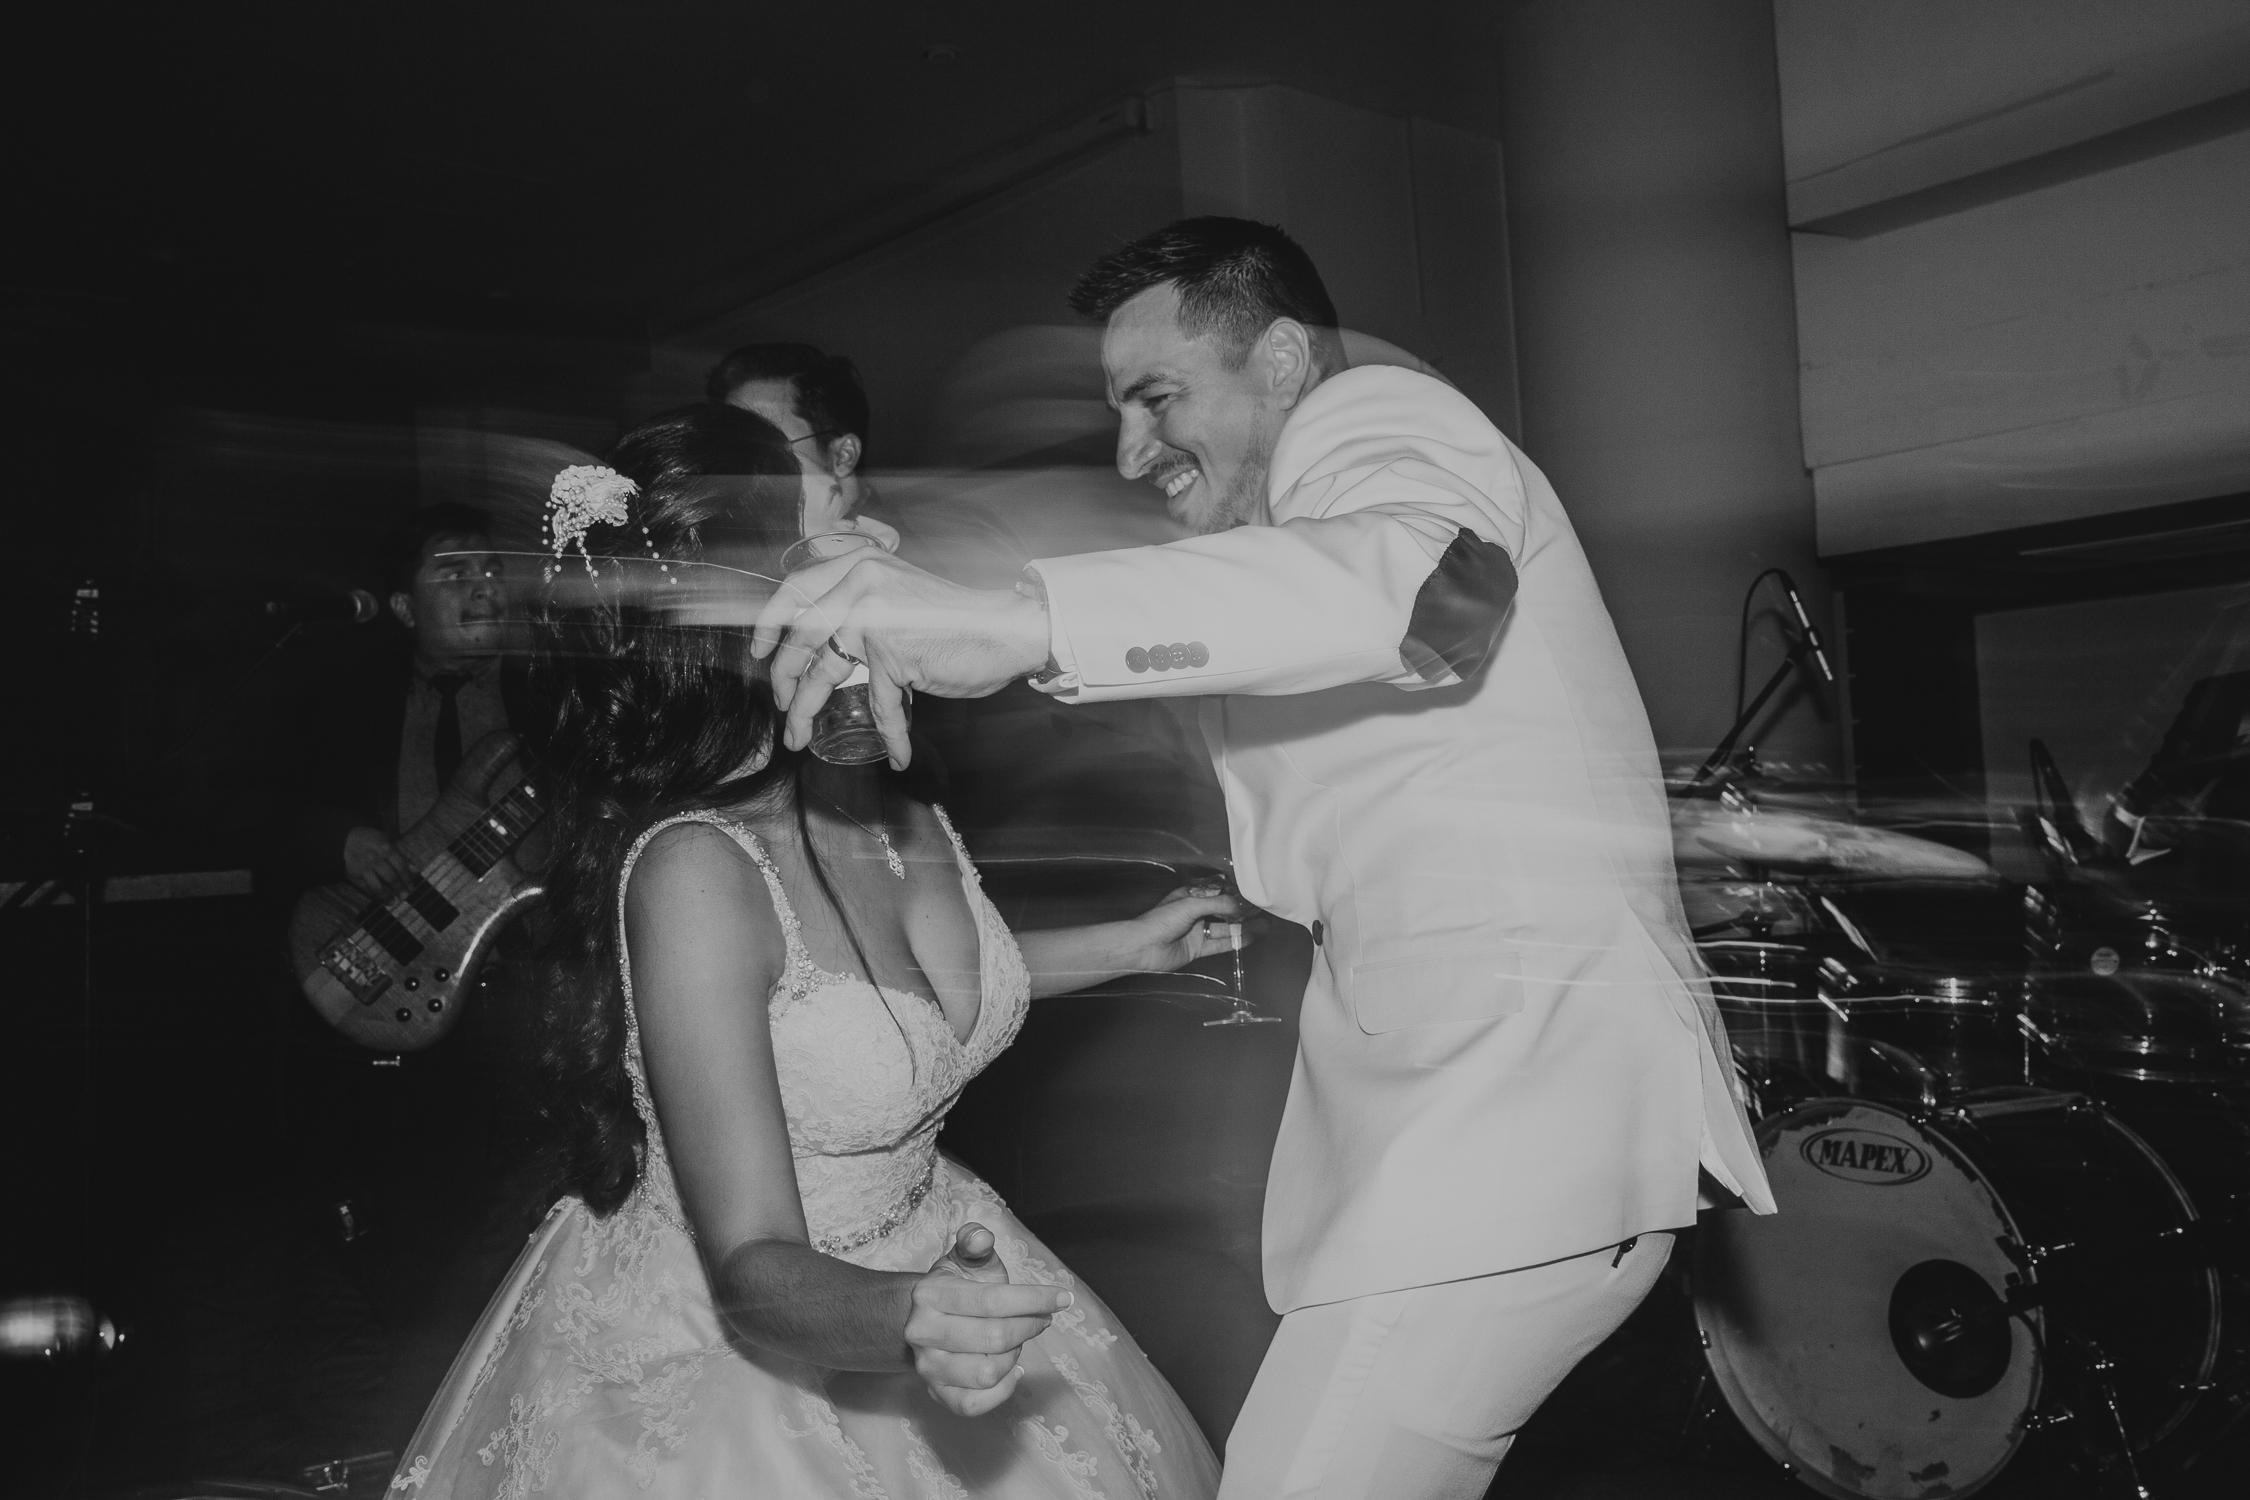 Michelle-Agurto-Fotografia-Bodas-Ecuador-Destination-Wedding-Photographer-Daniela-Dirk-92.JPG